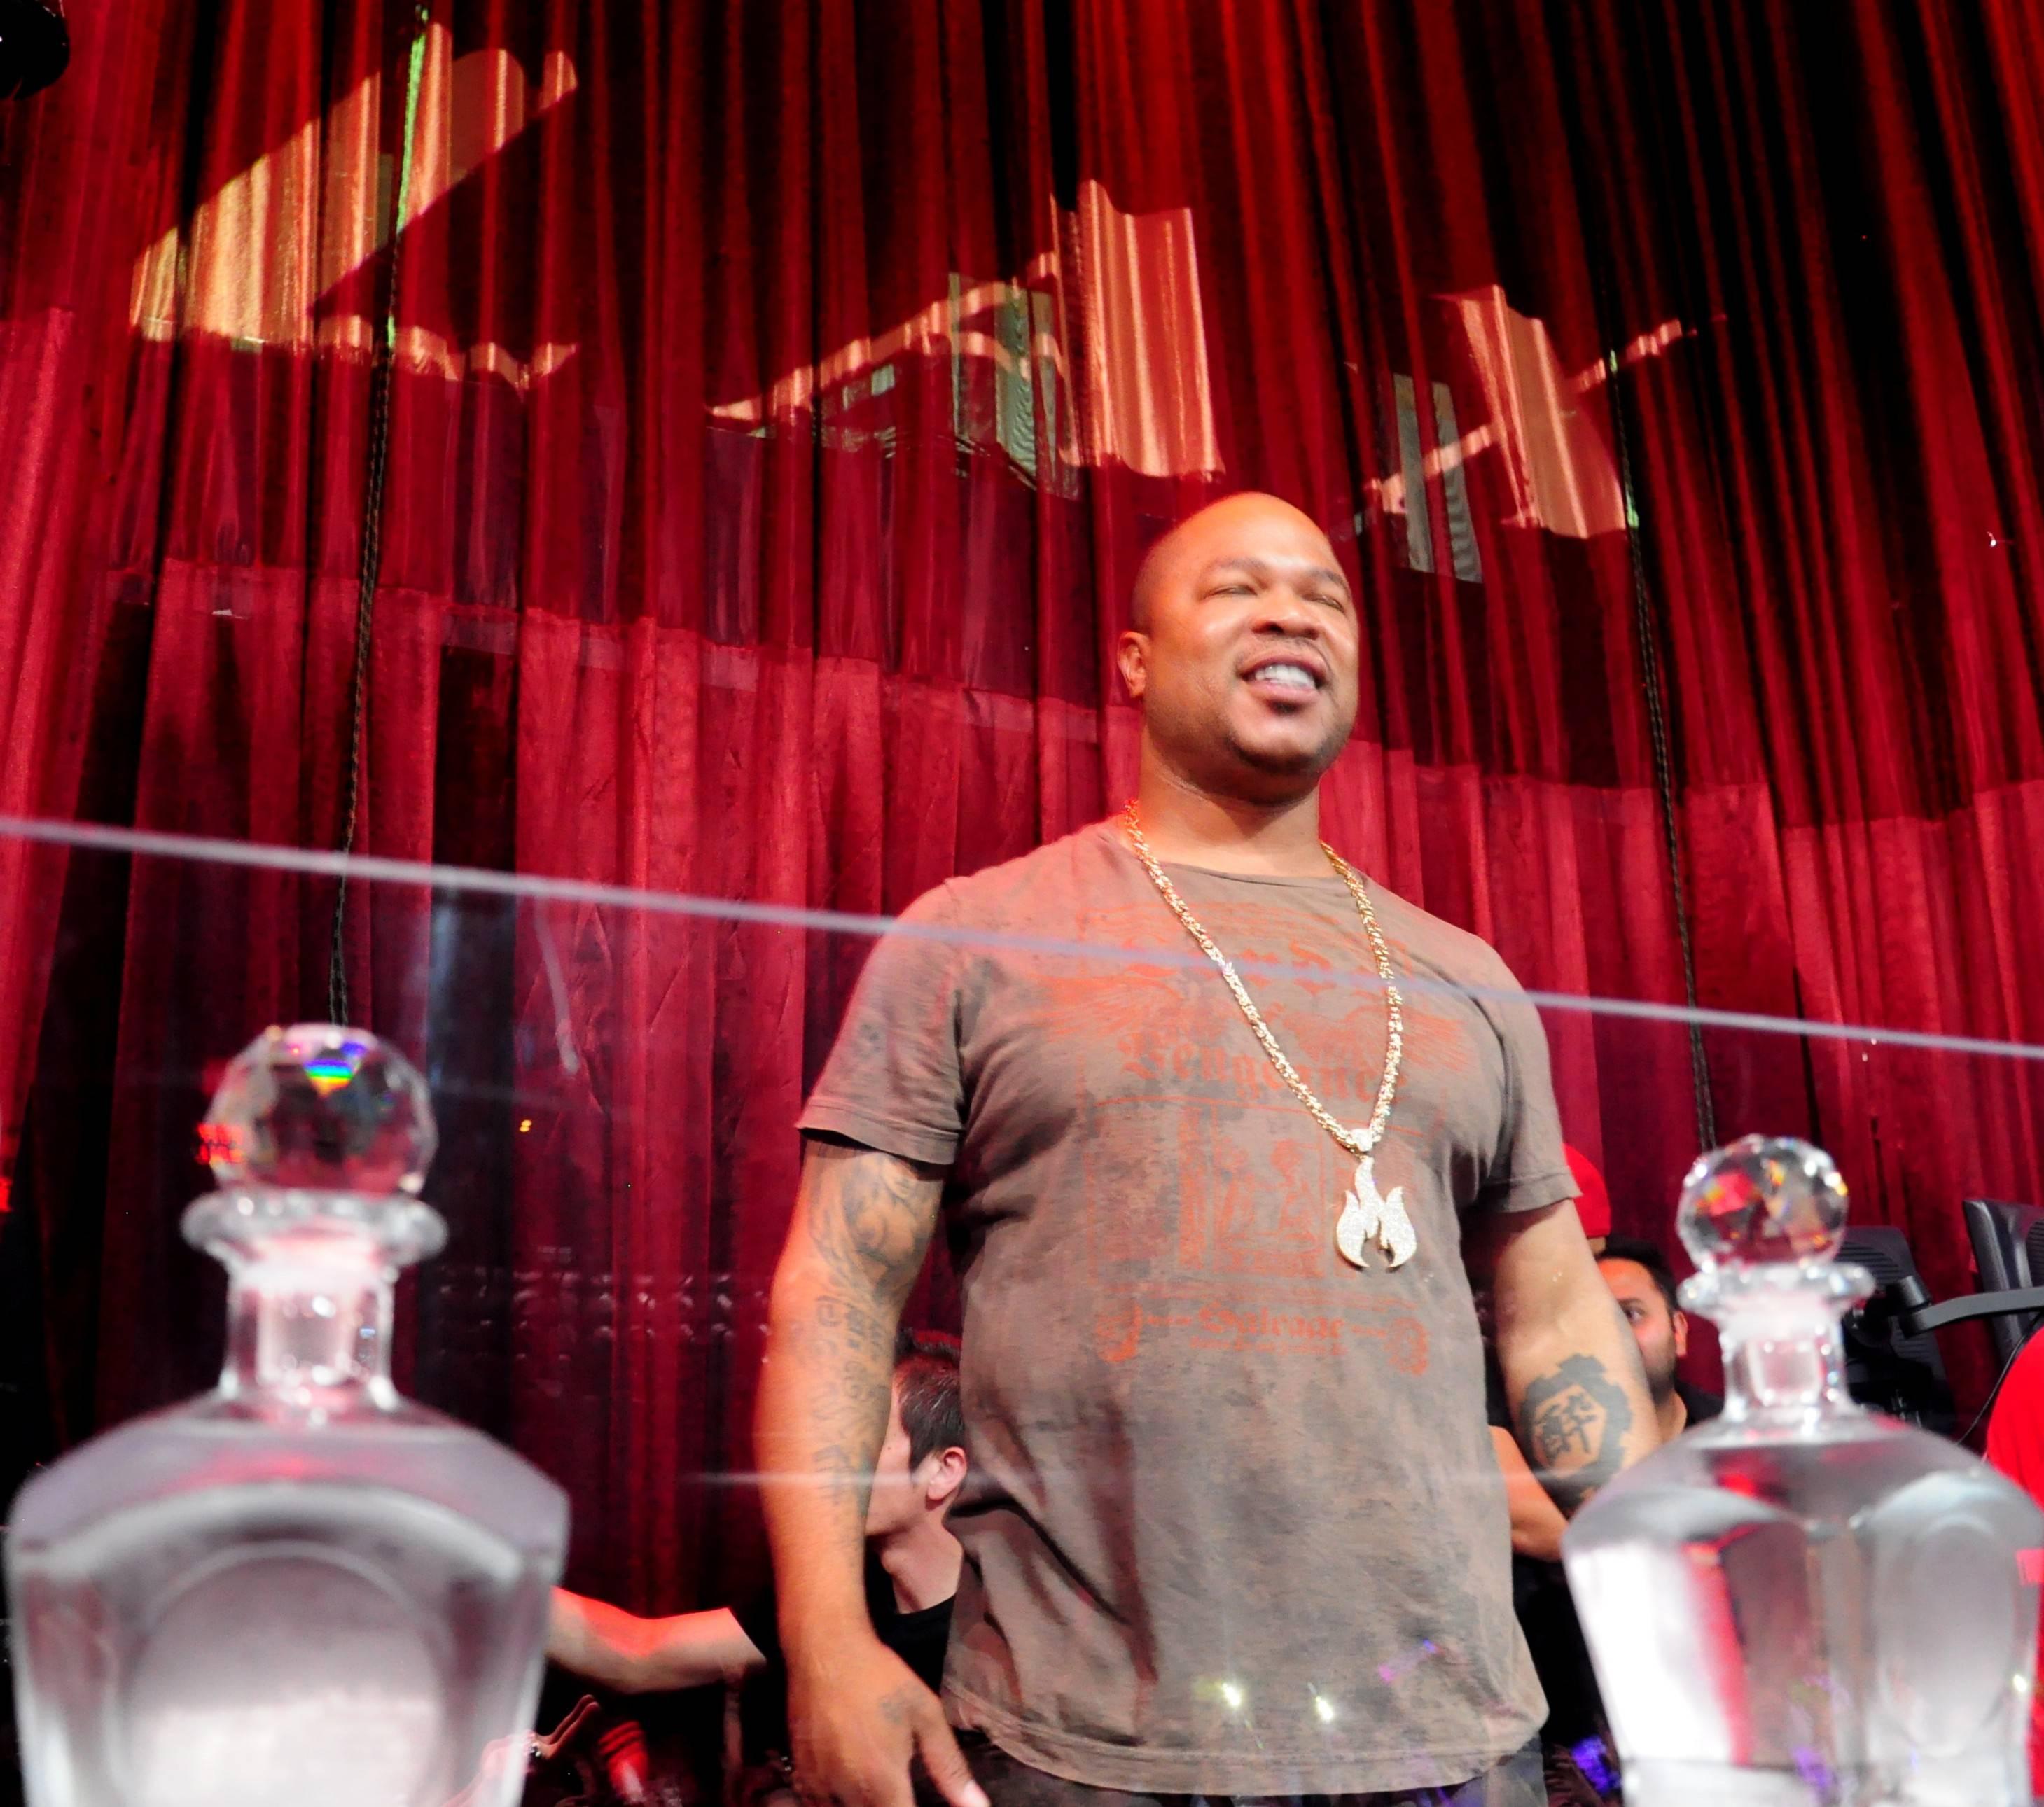 Xzibit at LAX Nightclub. Photos: Toby Acuna/SpyOn Vegas